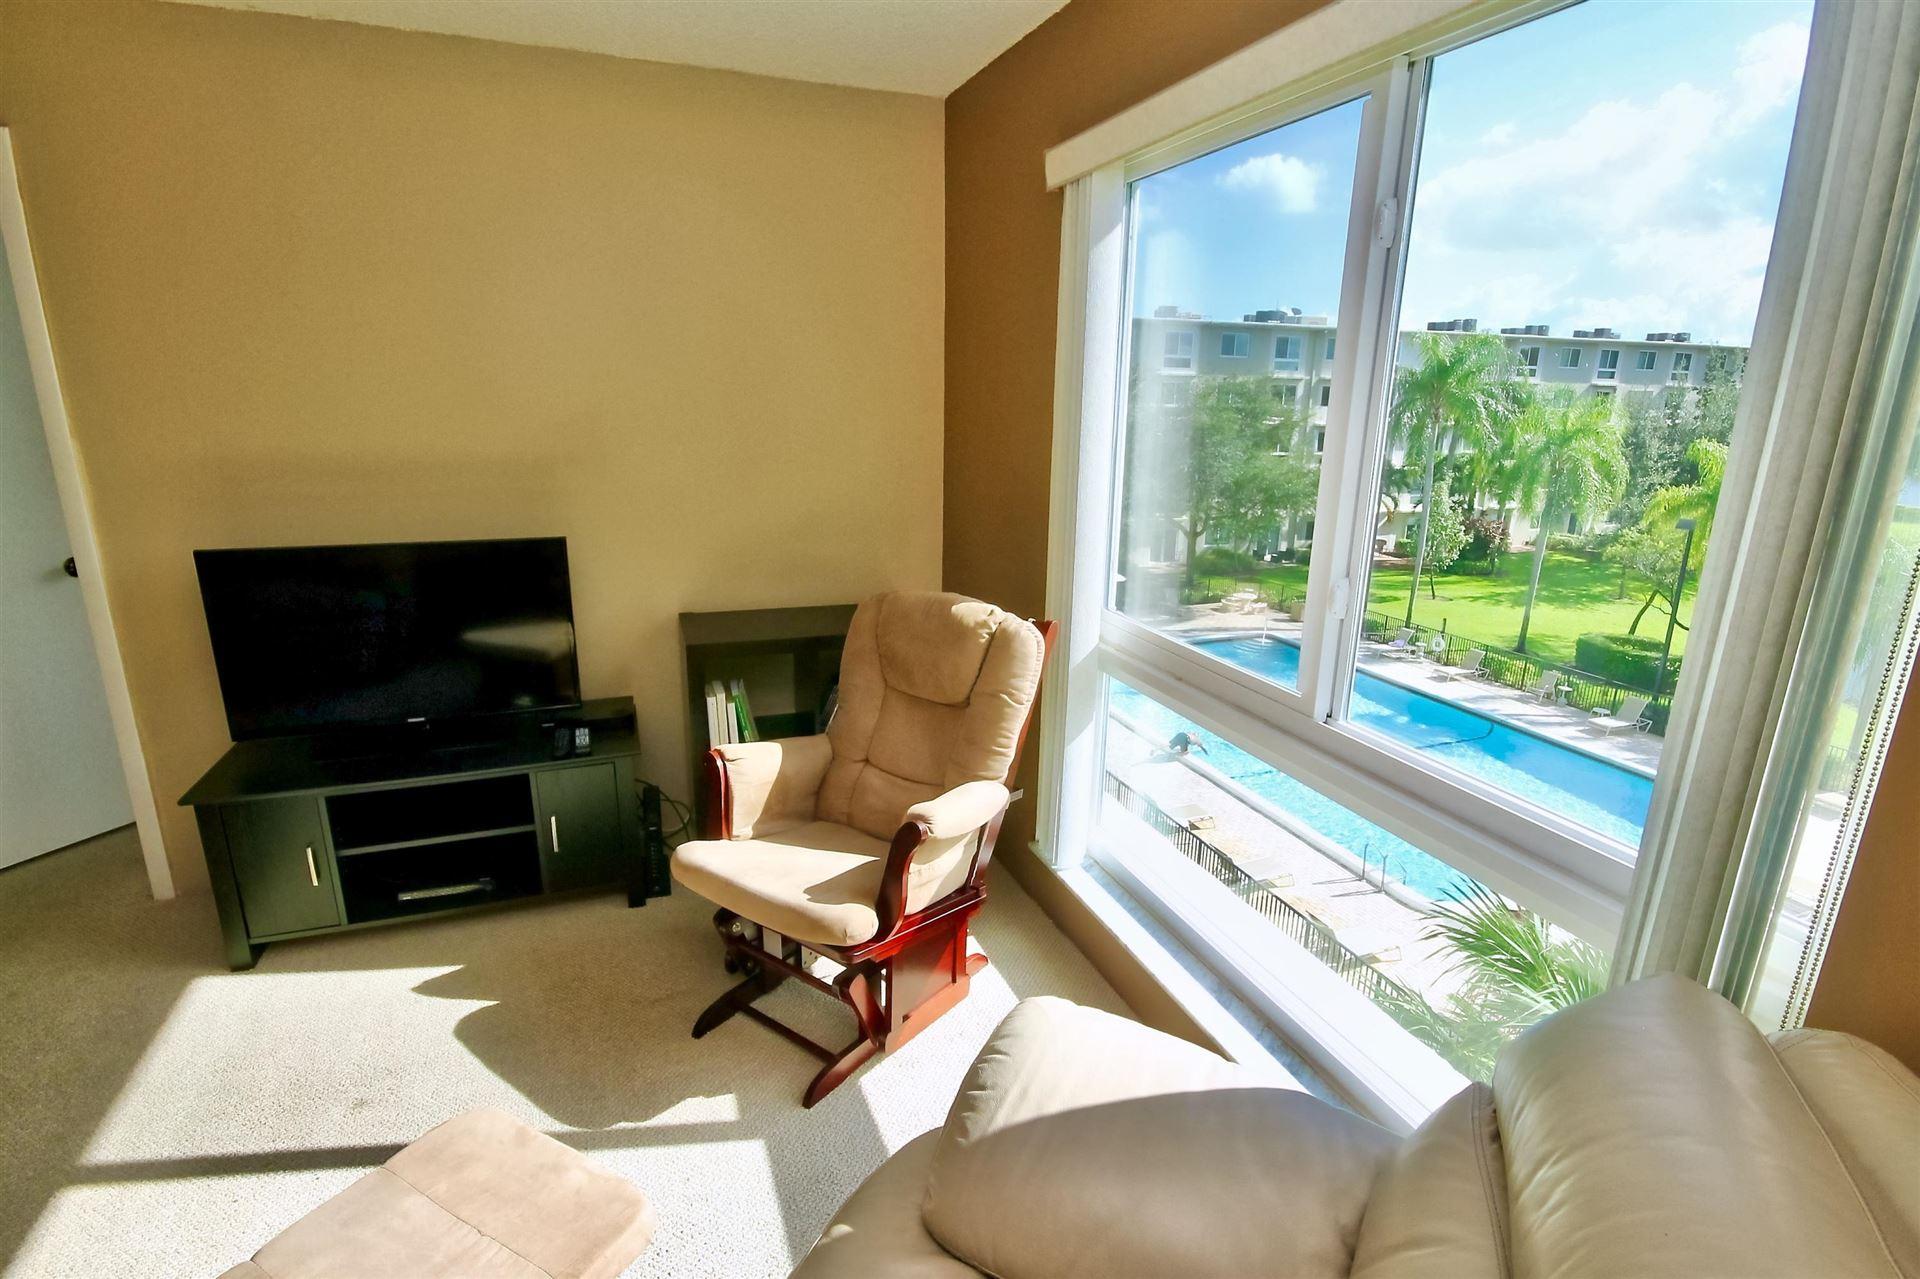 Photo of 2216 N Cypress Bend Drive #405, Pompano Beach, FL 33069 (MLS # RX-10657318)